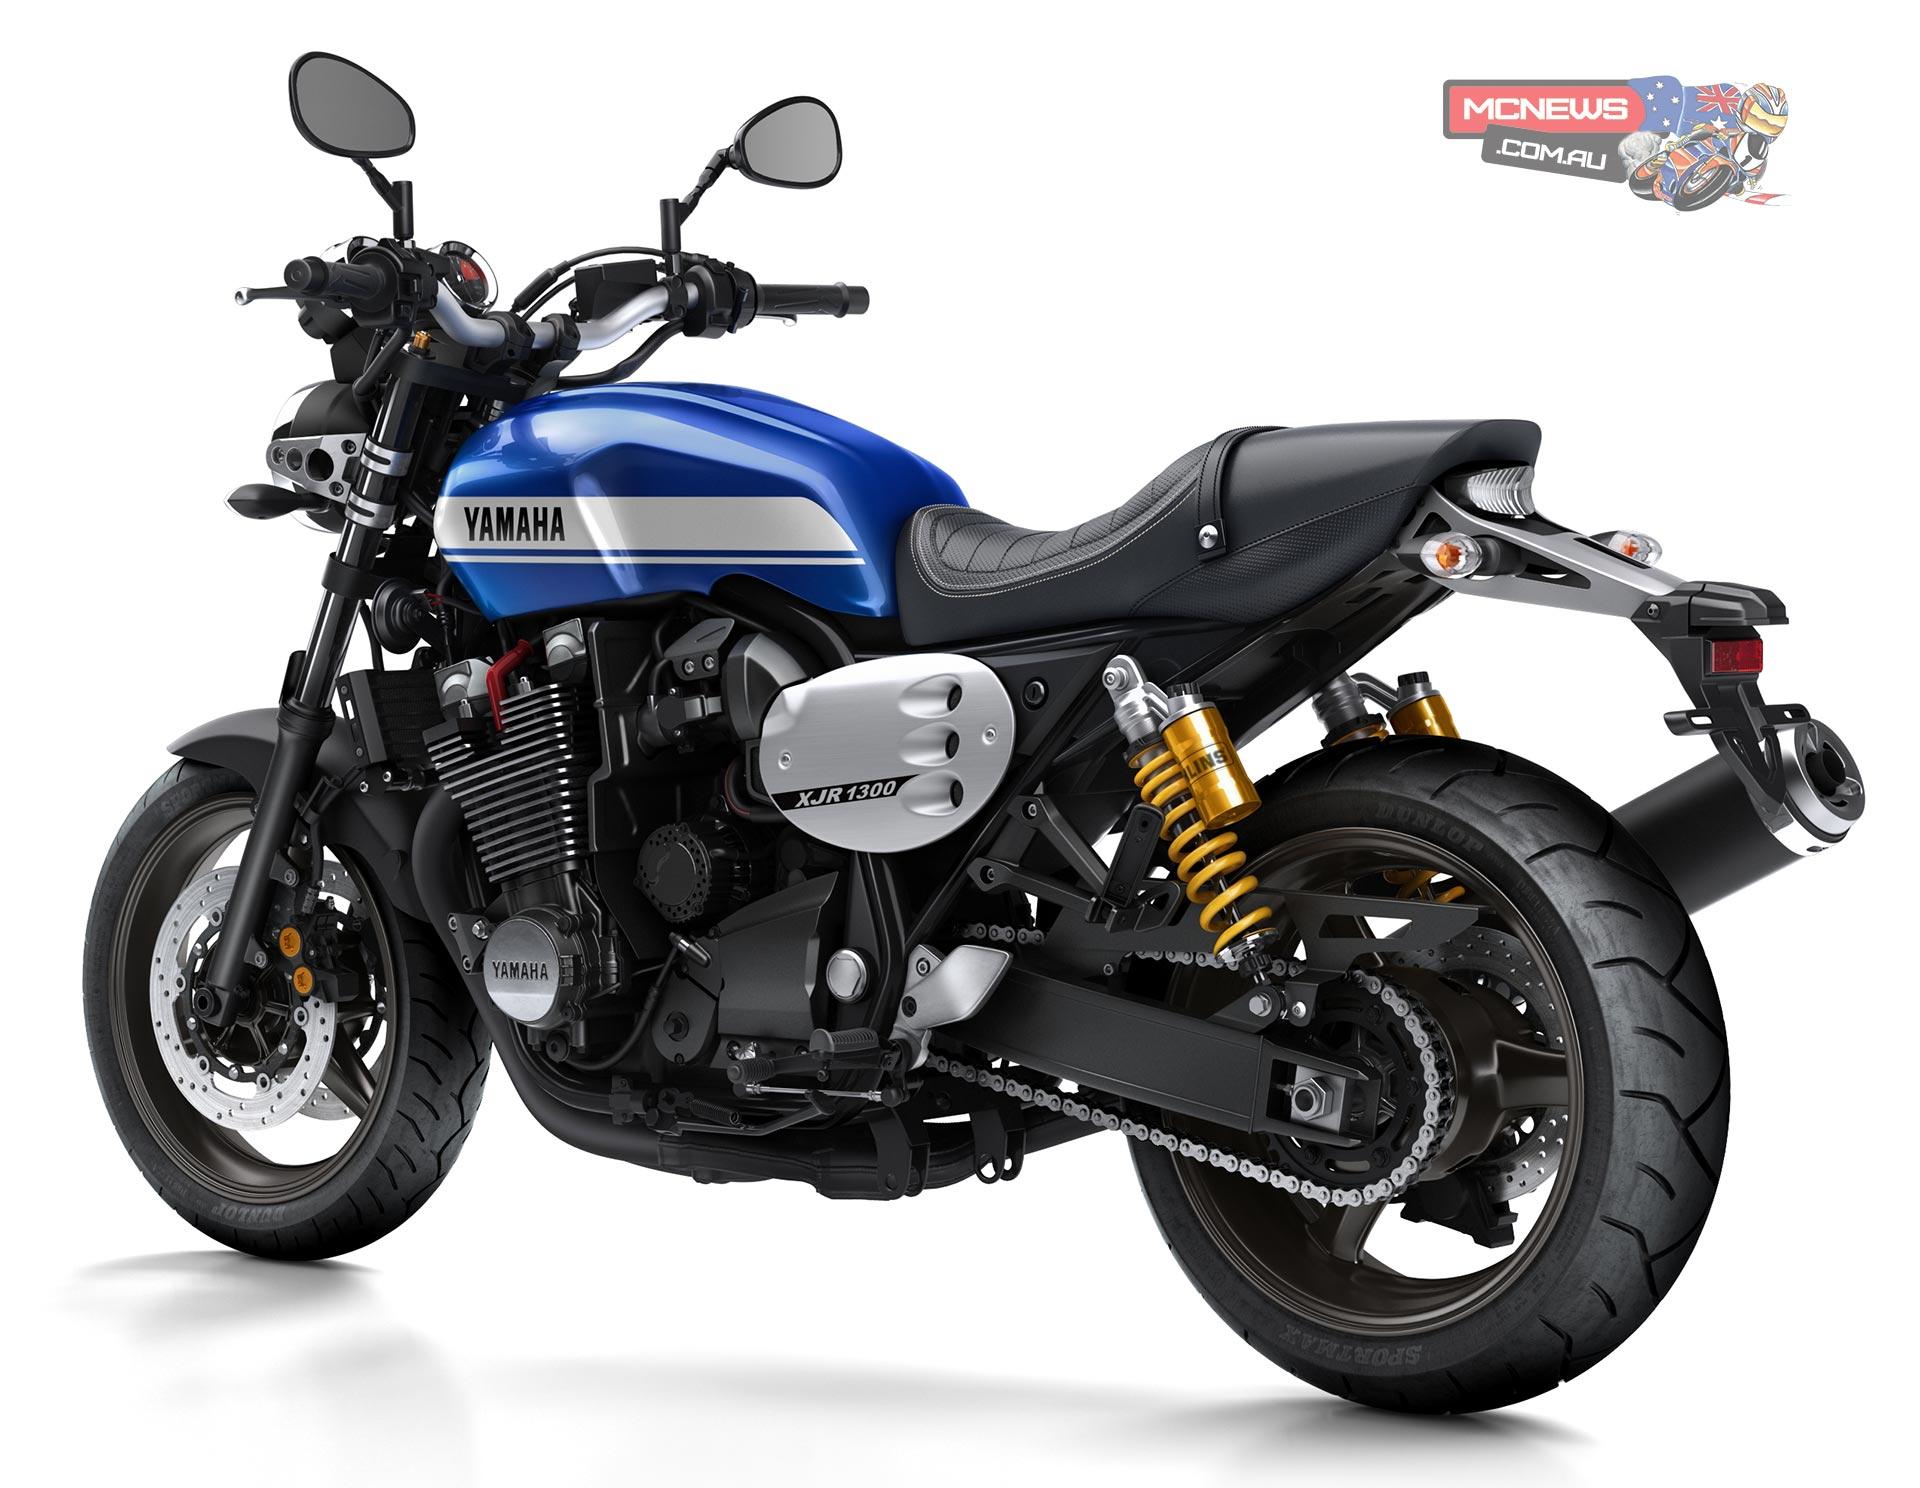 2018 Yamaha XVS950 Bolt R-spec Motorcycle UAEs Prices